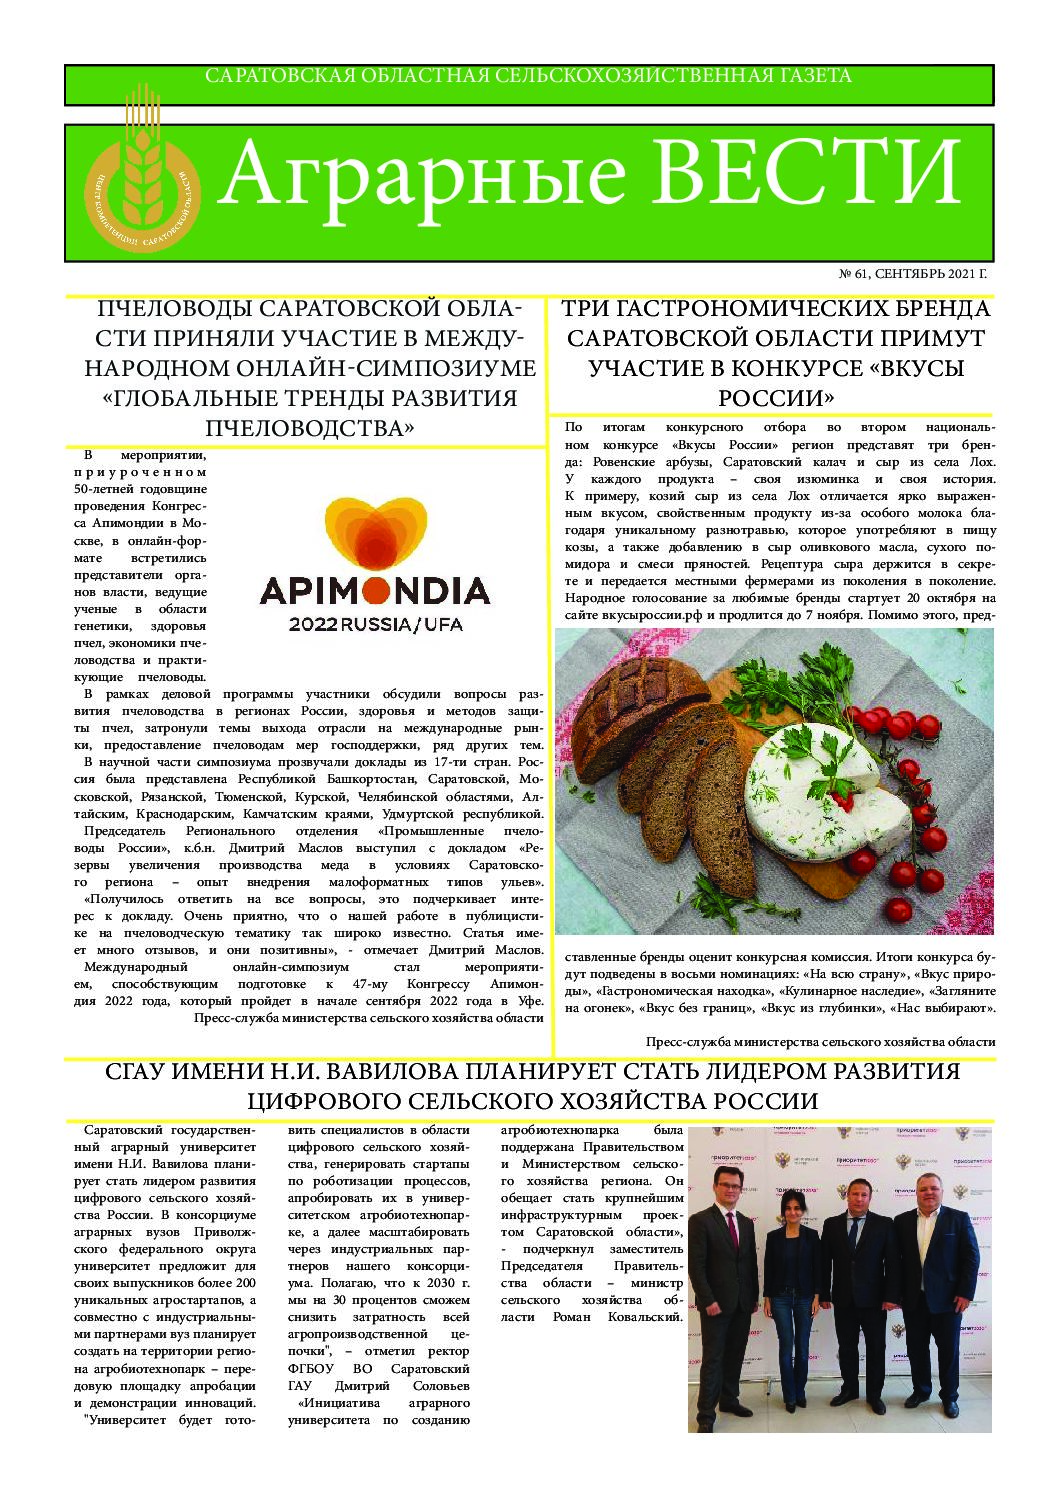 https://saratovagro.ru/wp-content/uploads/2021/10/Газета-сентябрь-2021-pdf.jpg